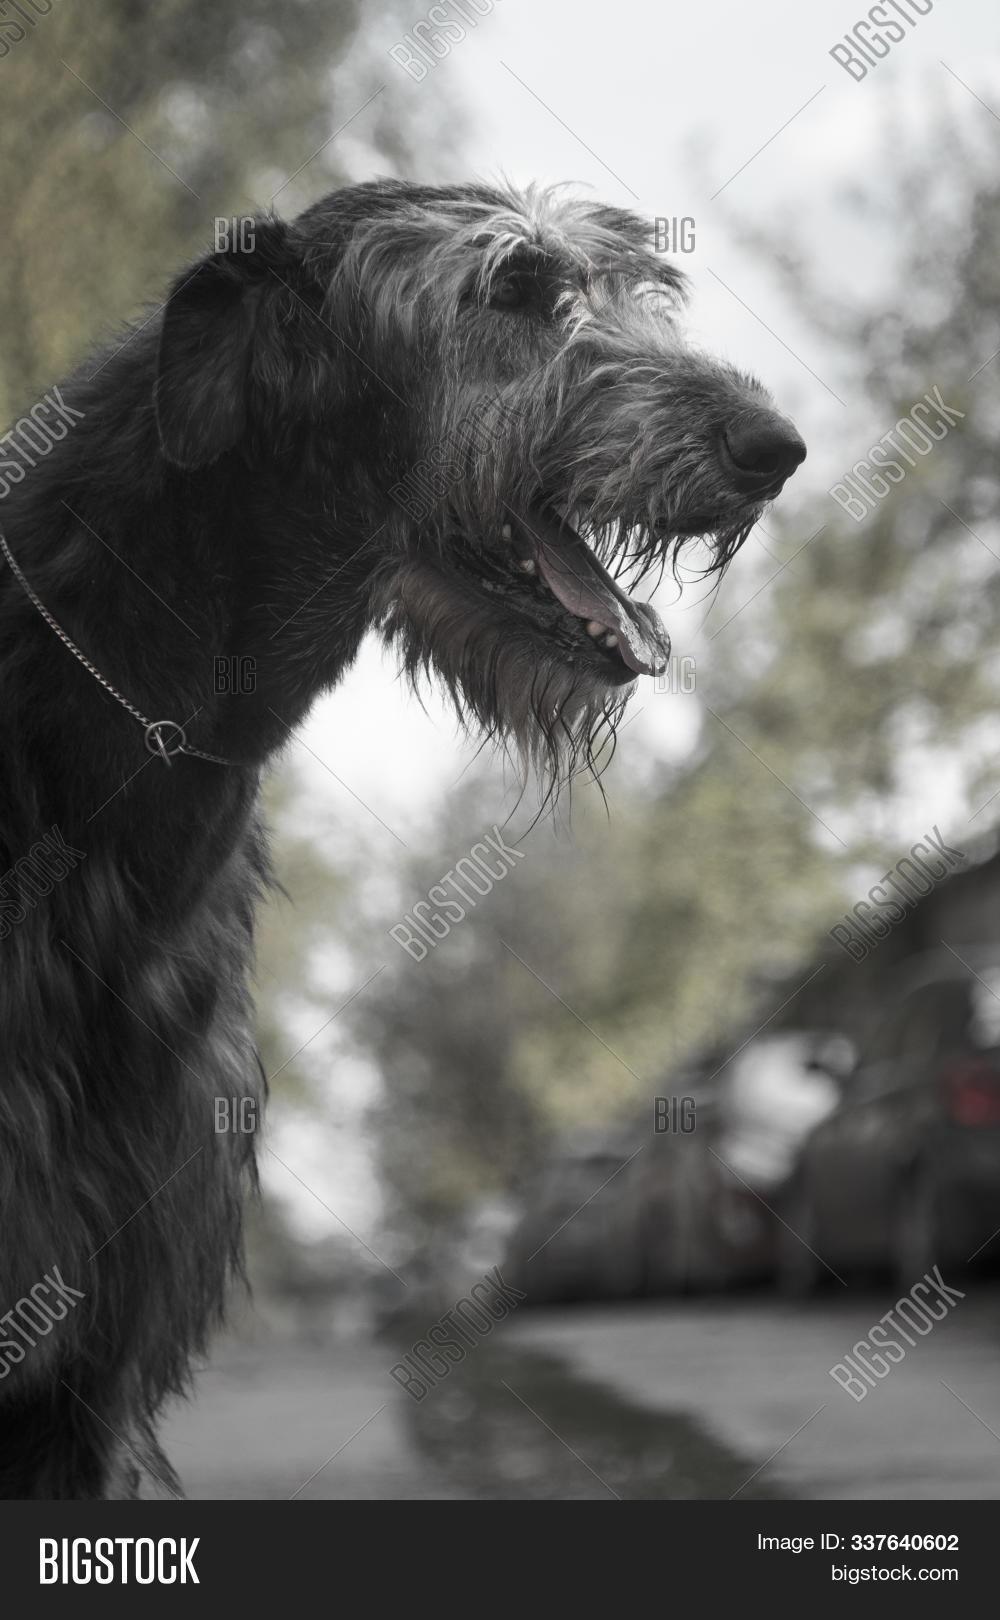 Irish Wolfhound Breed Image Photo